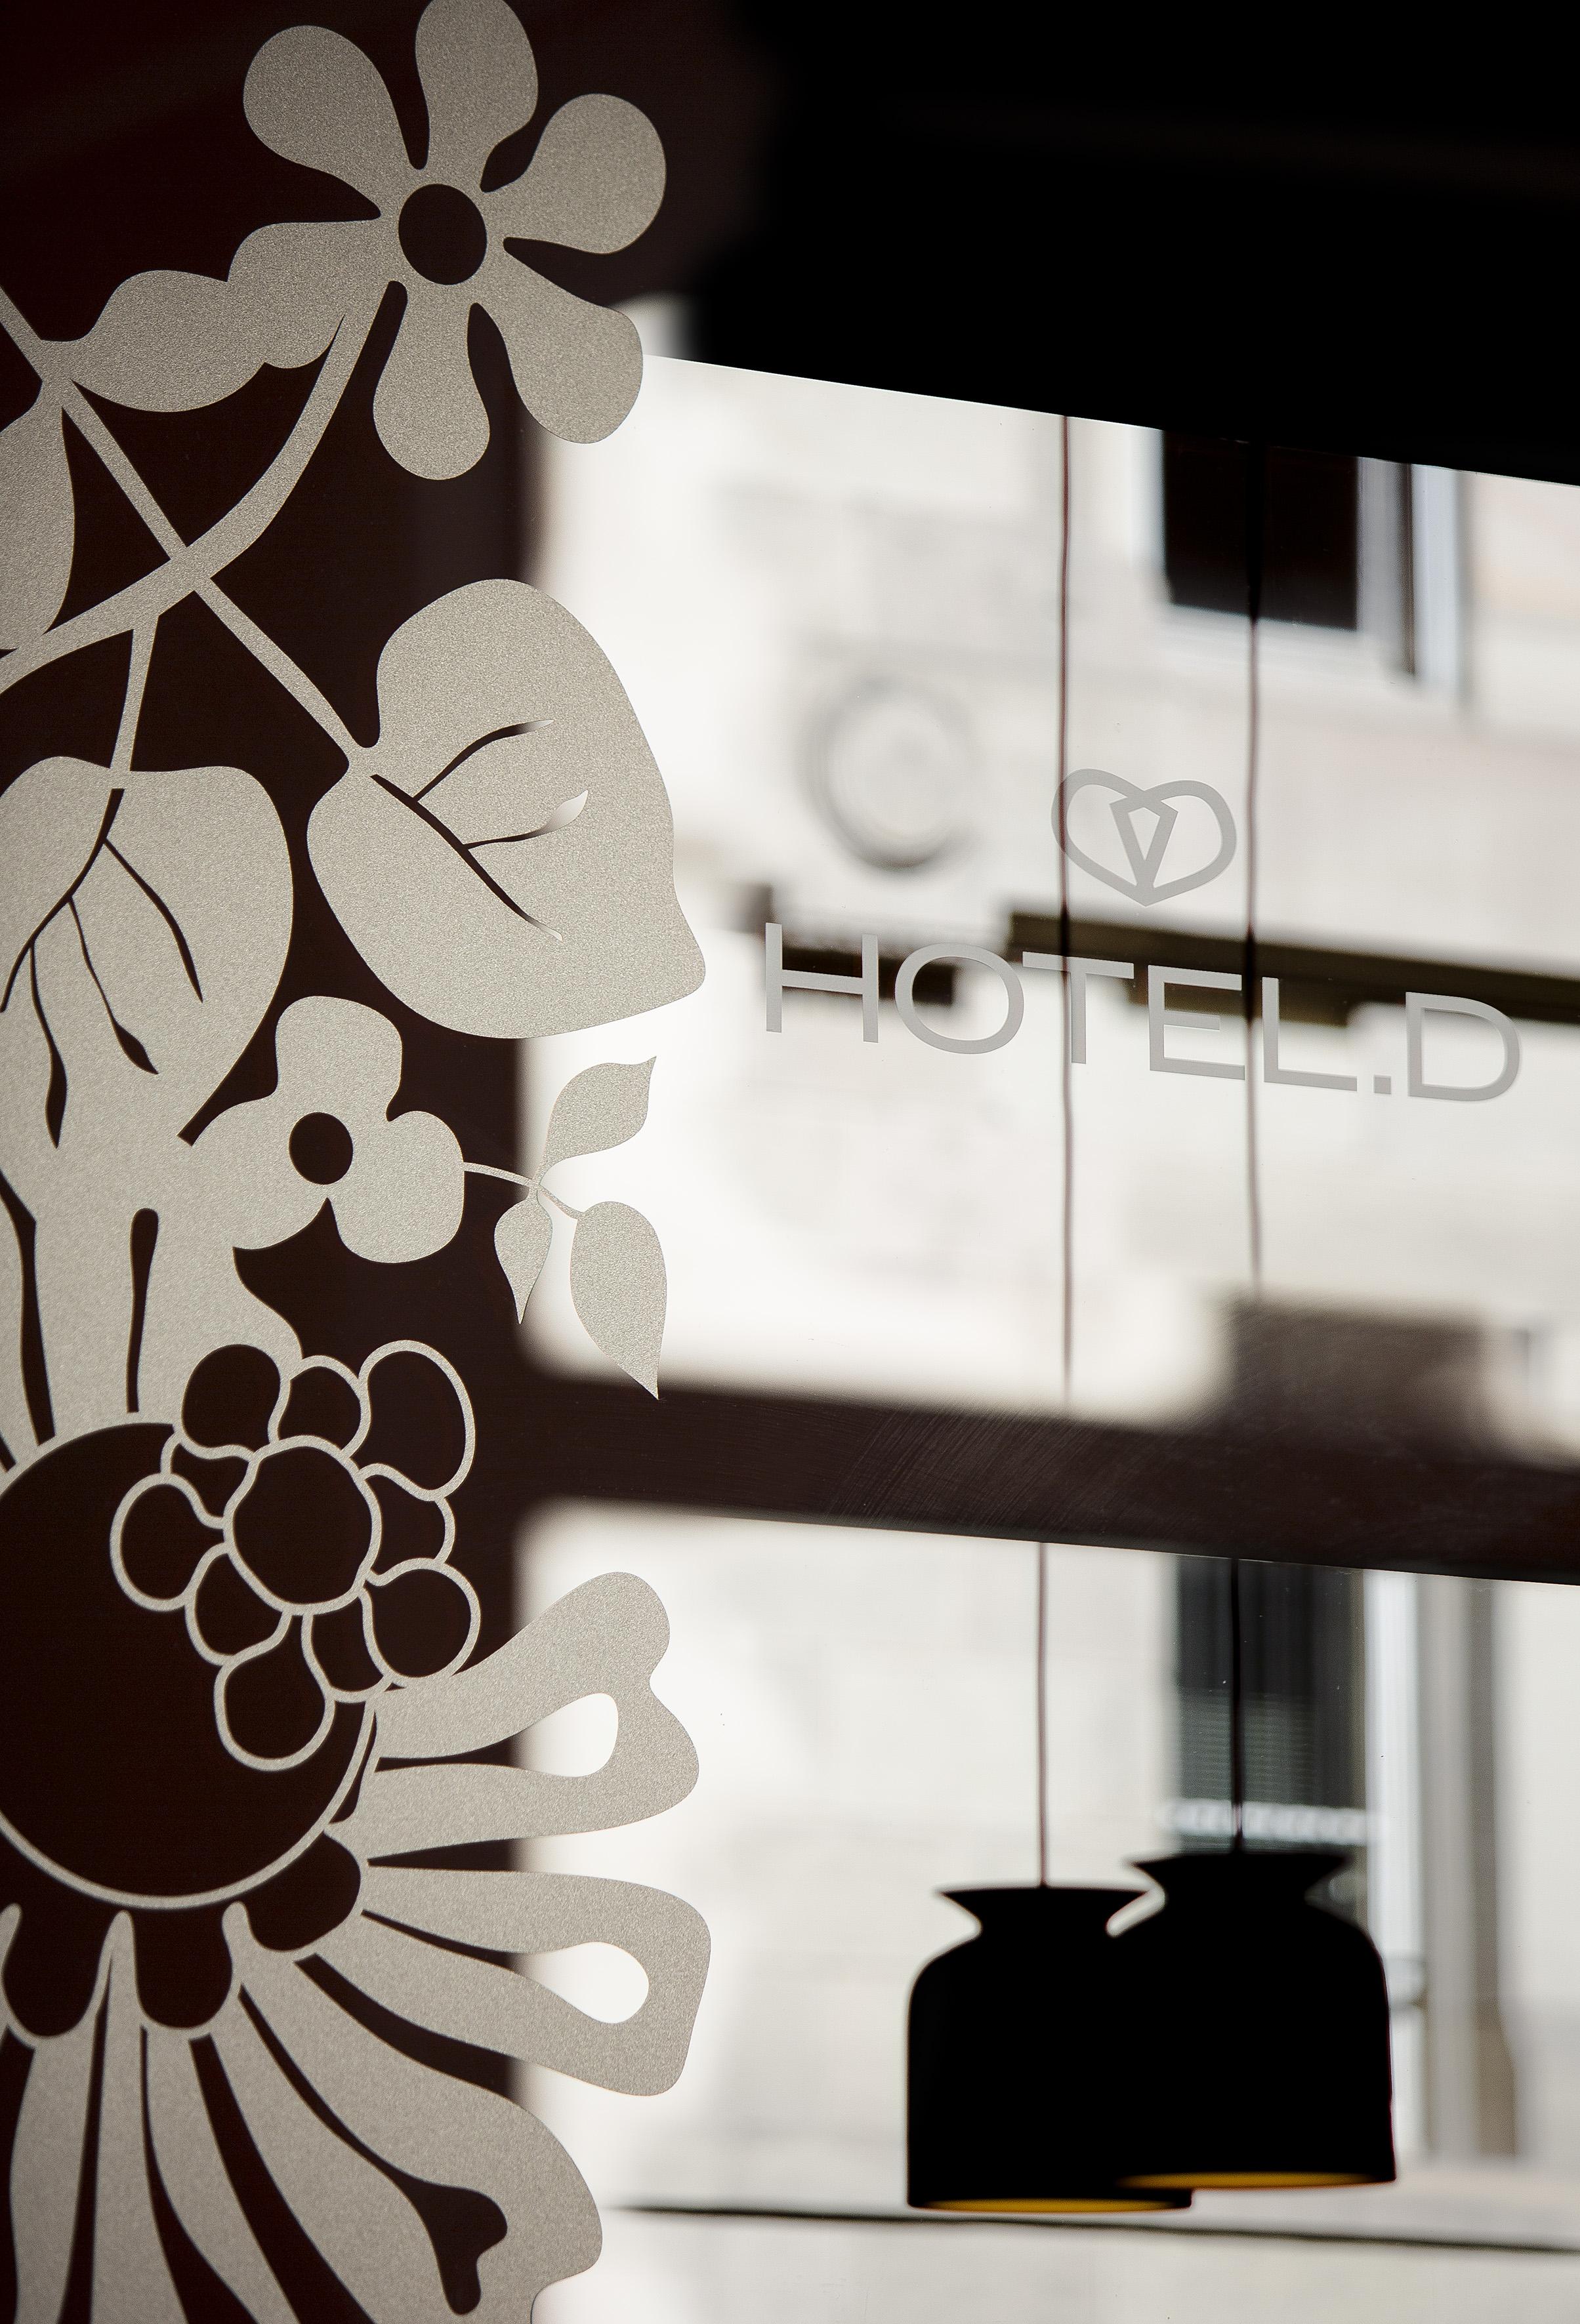 hotel-d-strasbourg-photo-christophe bielsa-reception-25 md.jpg